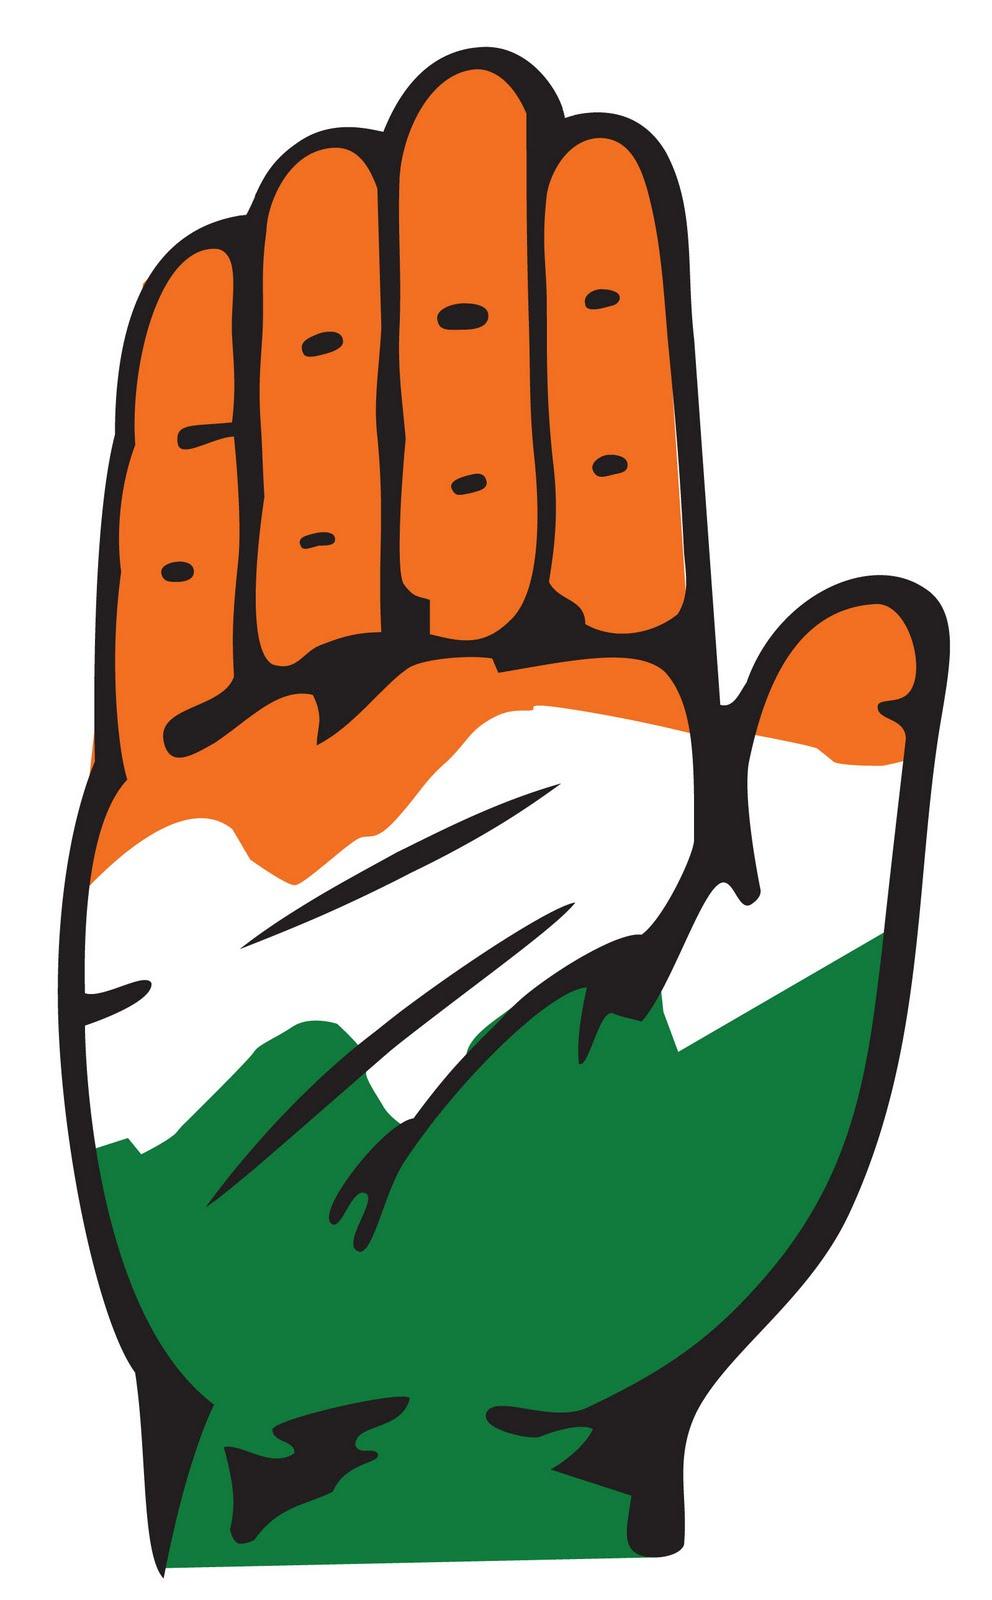 congress logos rh logolynx com congress loosens bank rules congress looking into hillary